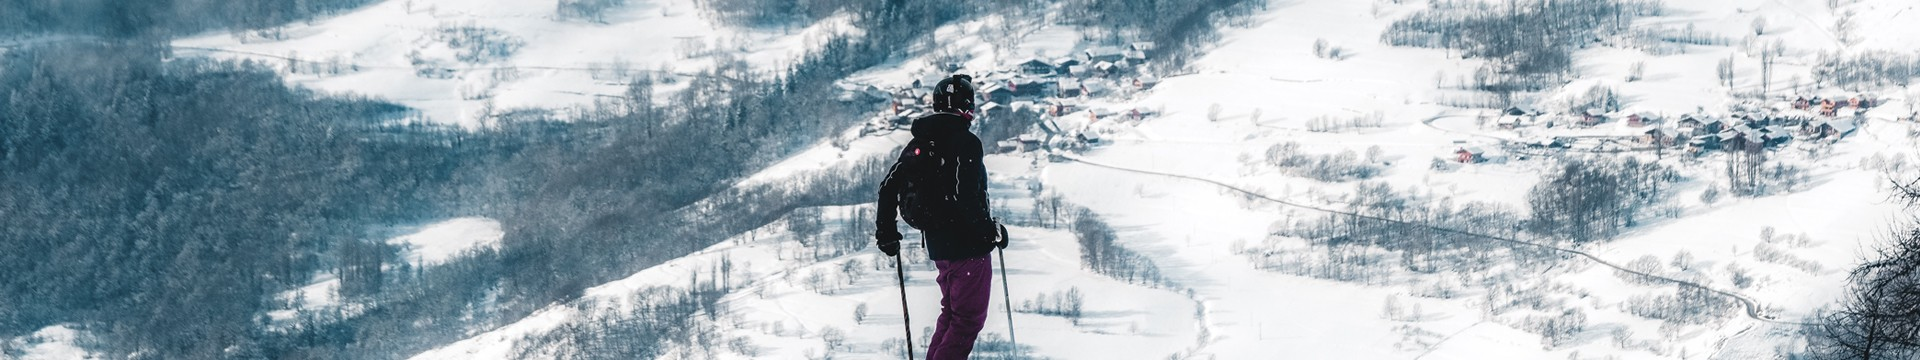 ski-04-8868